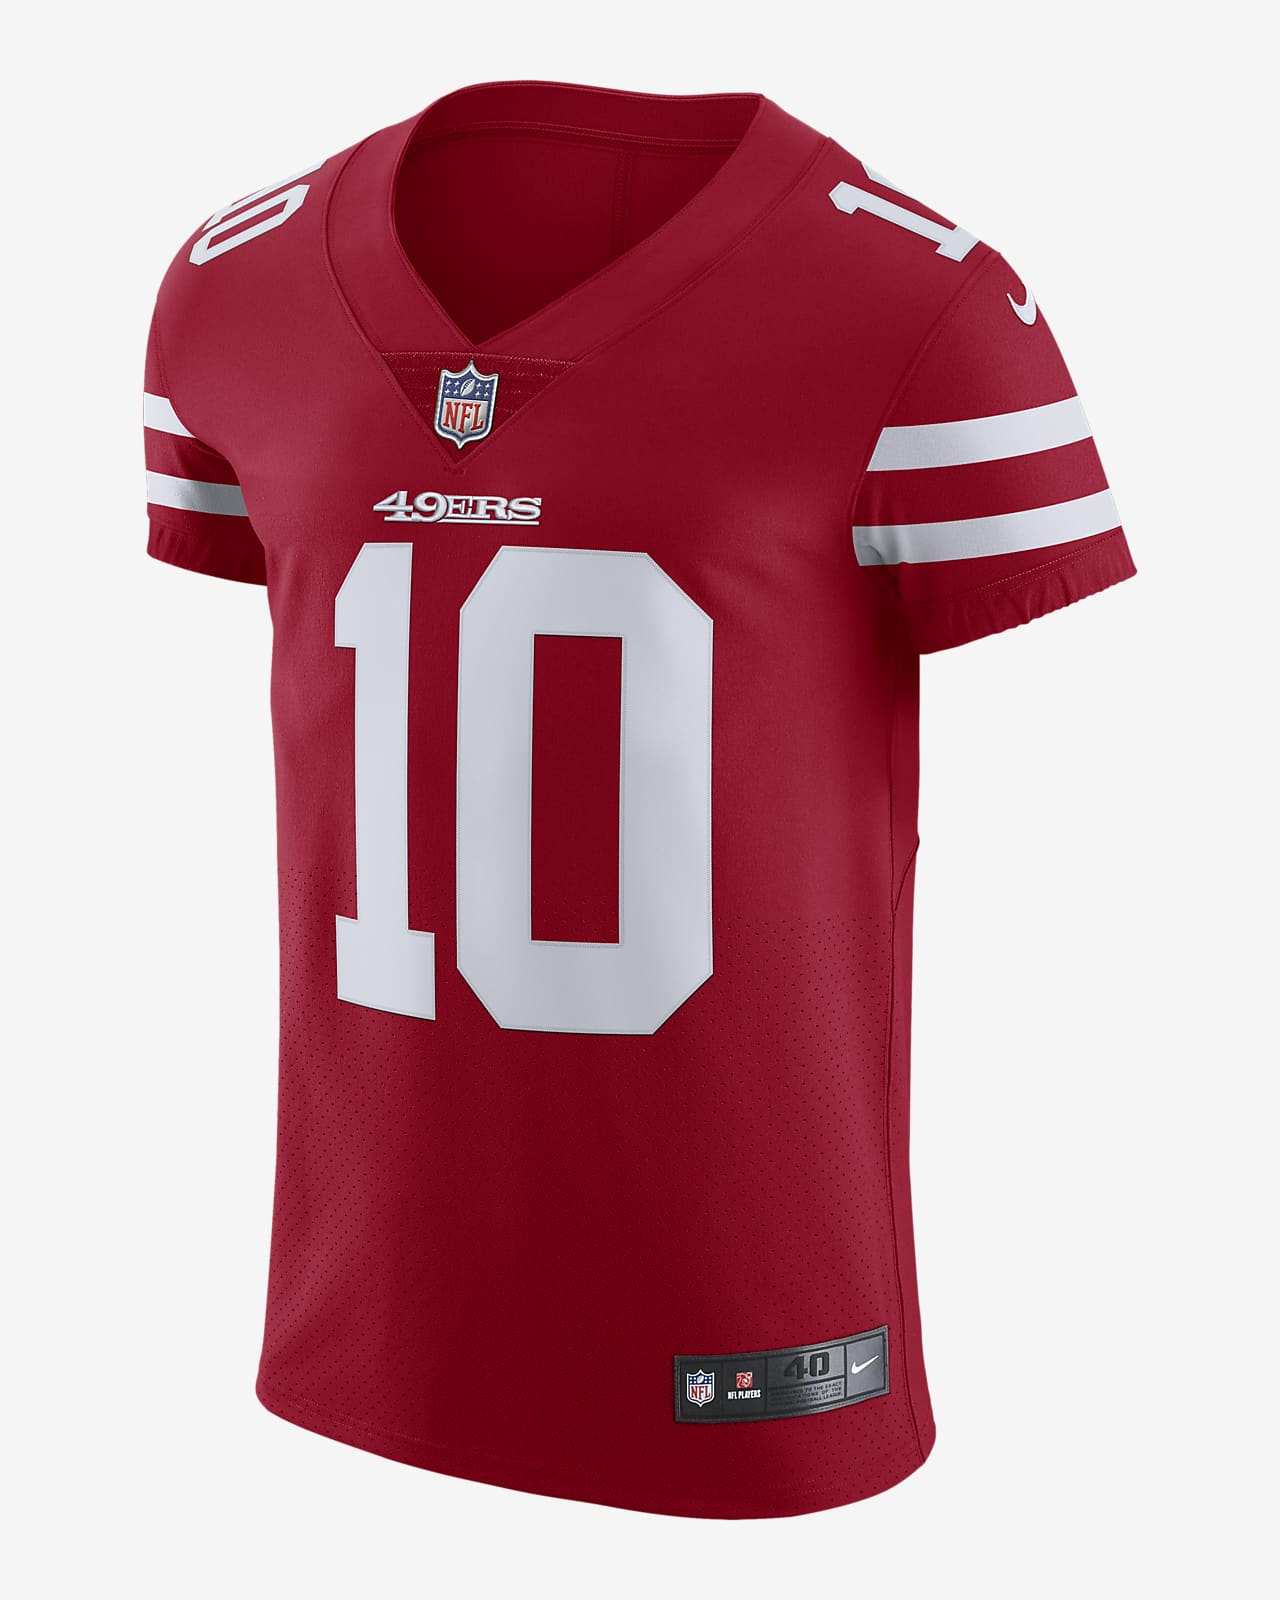 NFL San Francisco 49ers (Jimmy Garoppolo) Men's Elite Vapor Untouchable Football Jersey